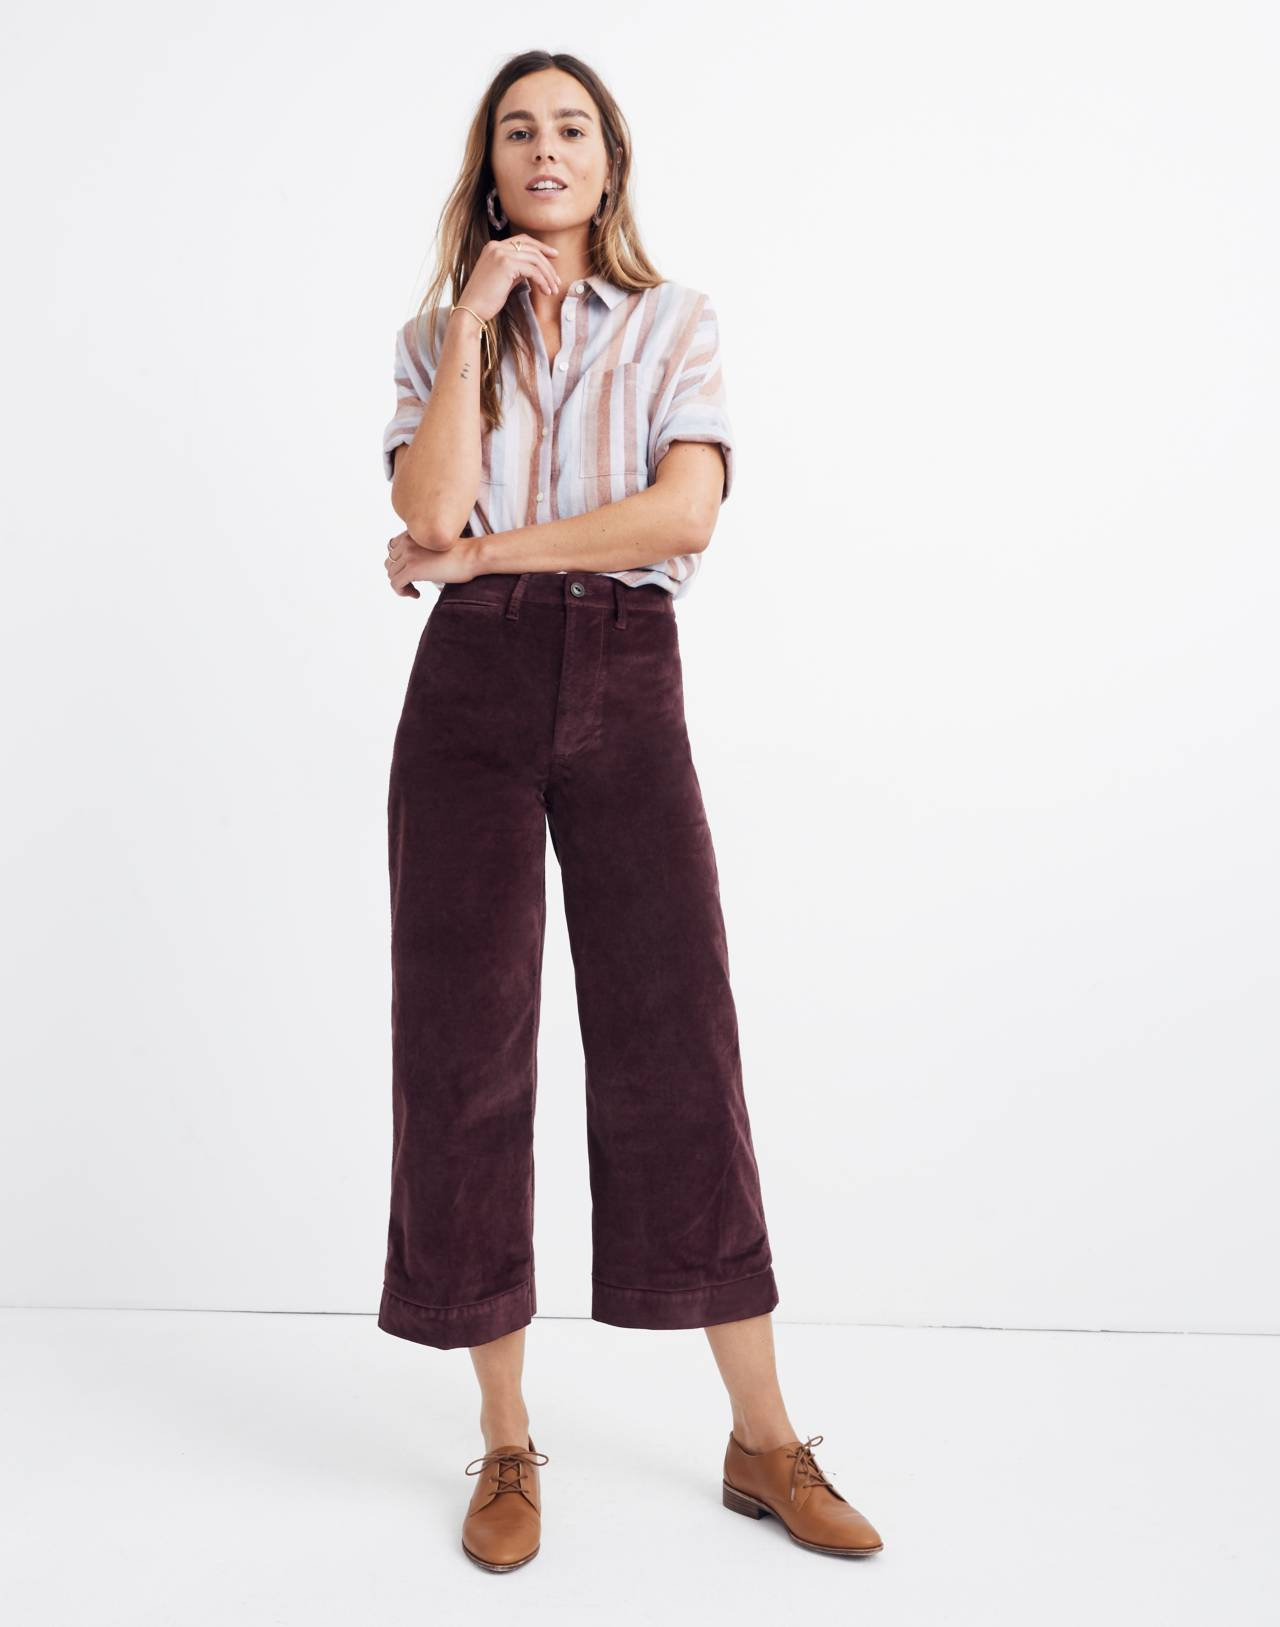 Emmett Wide-Leg Crop Pants in Velveteen in rich plum image 1